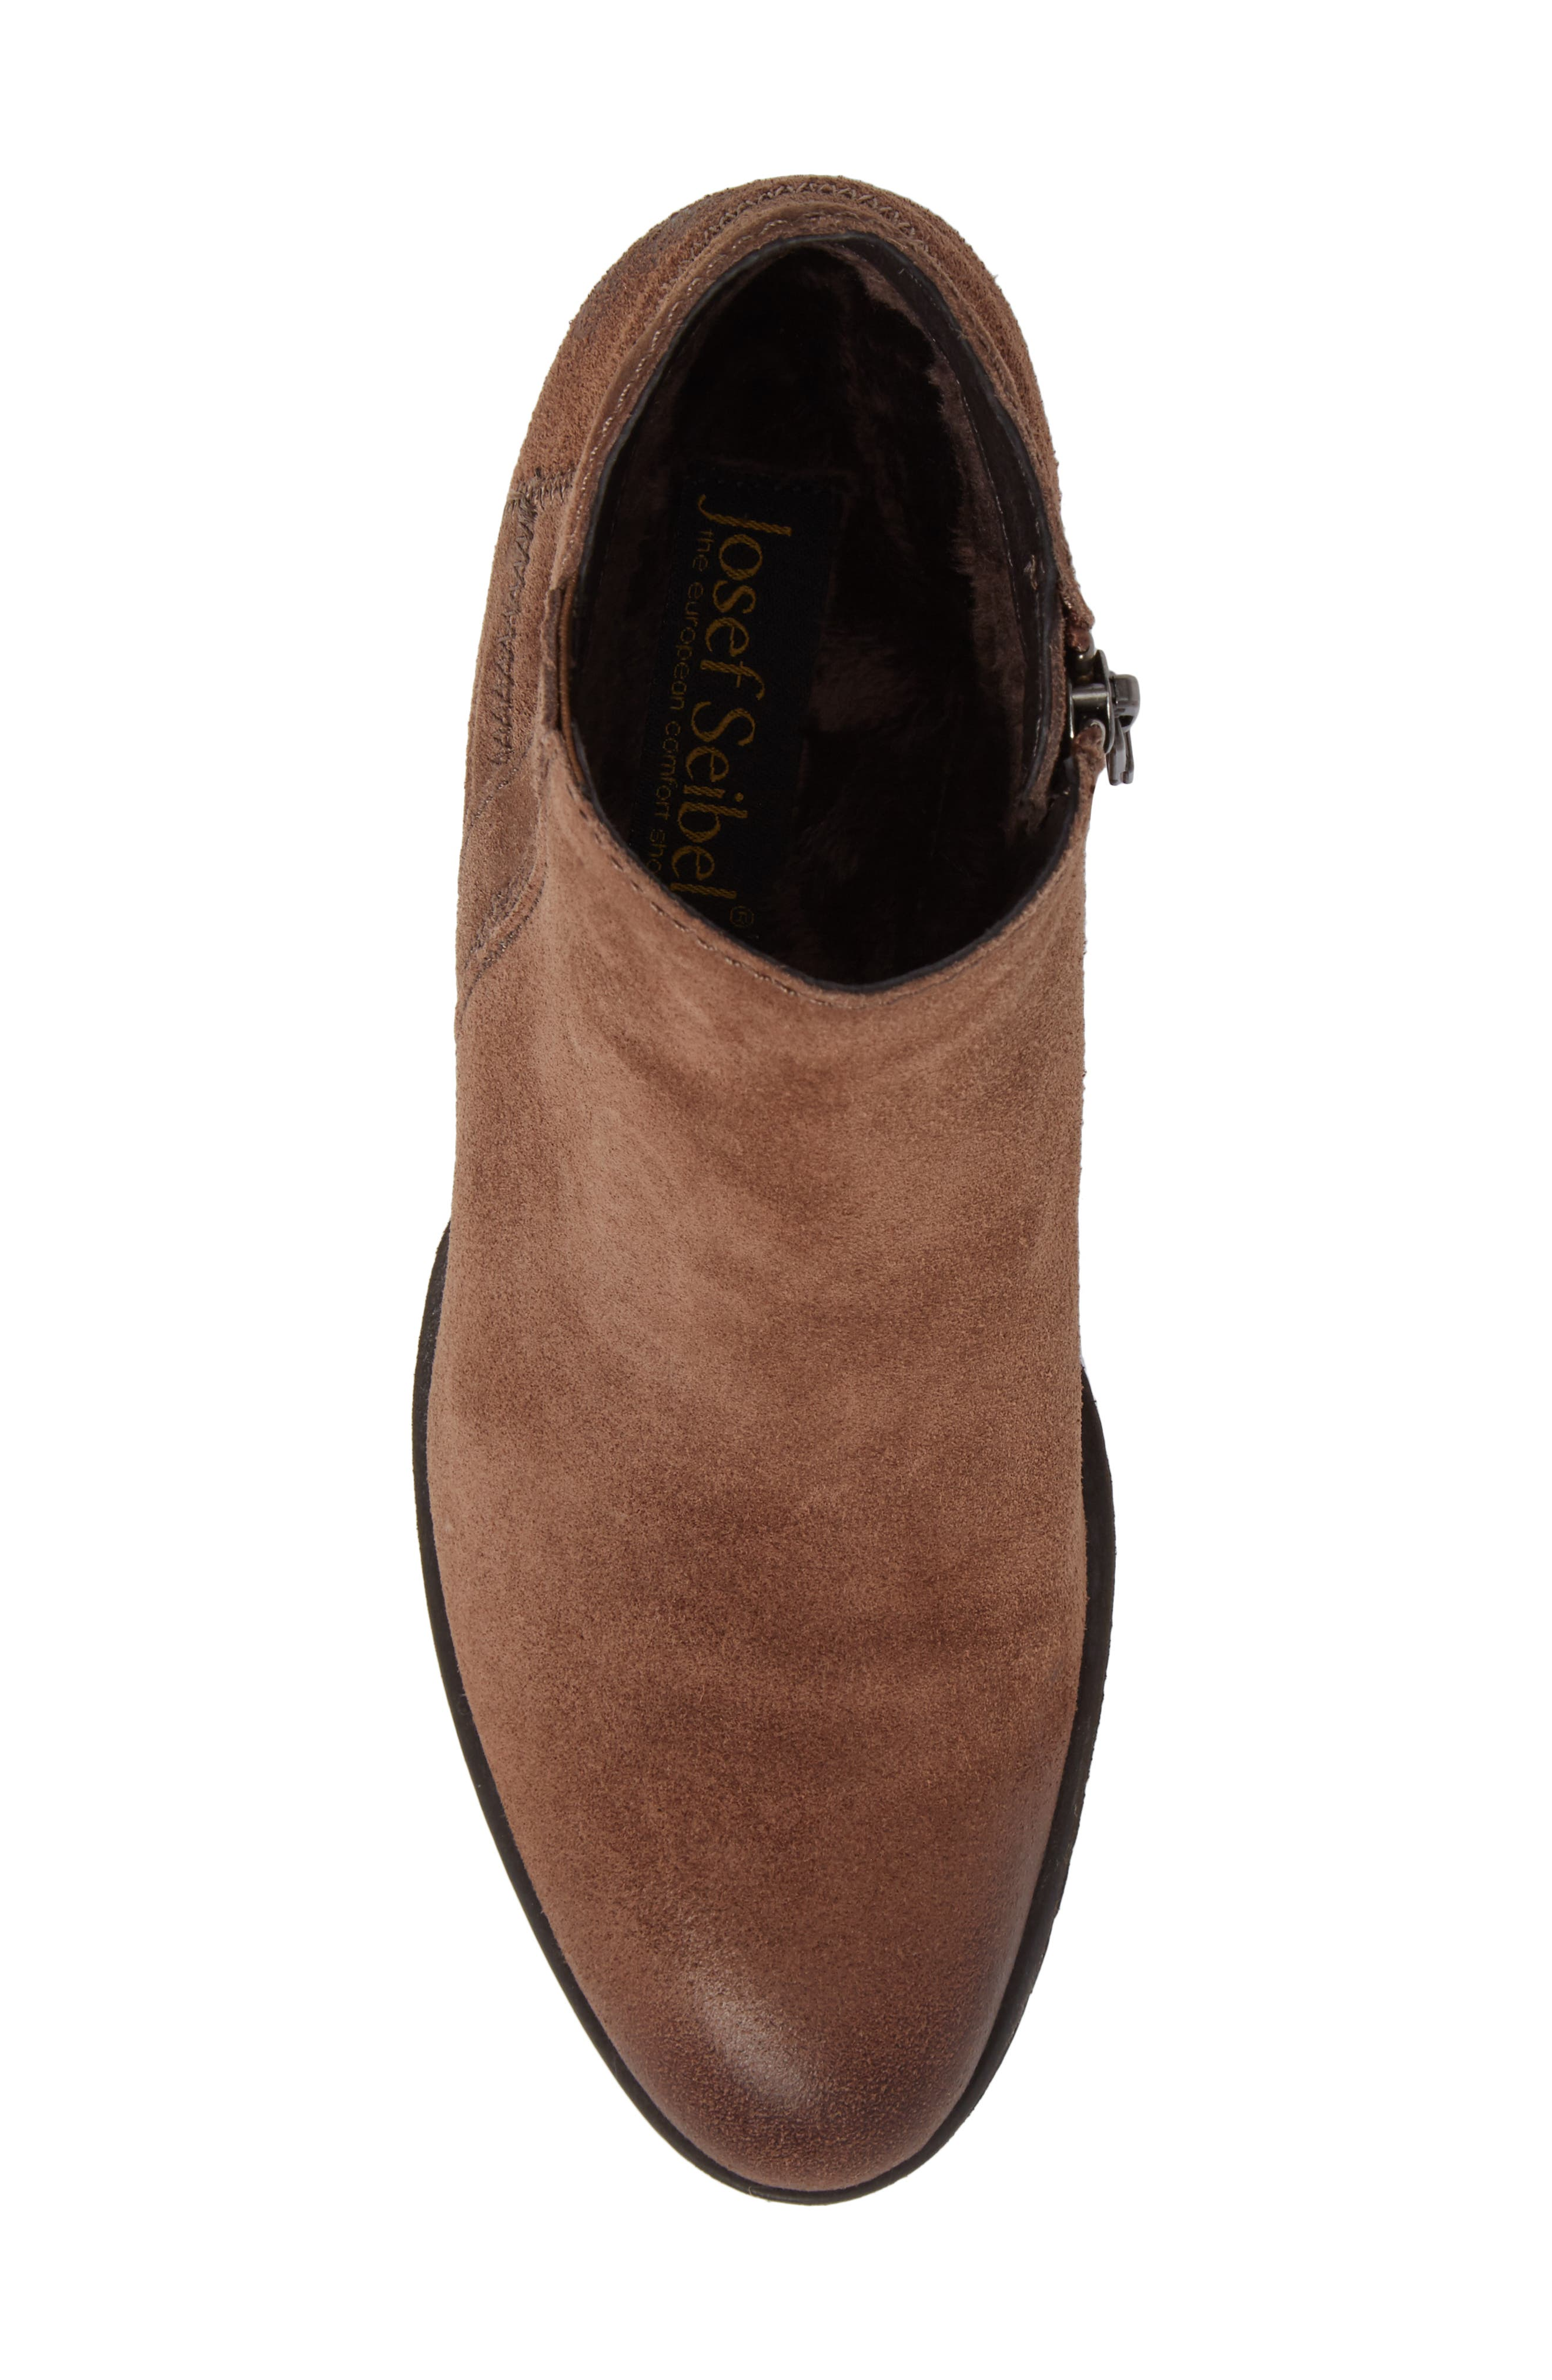 Daphne Bootie,                             Alternate thumbnail 4, color,                             Brown Leather